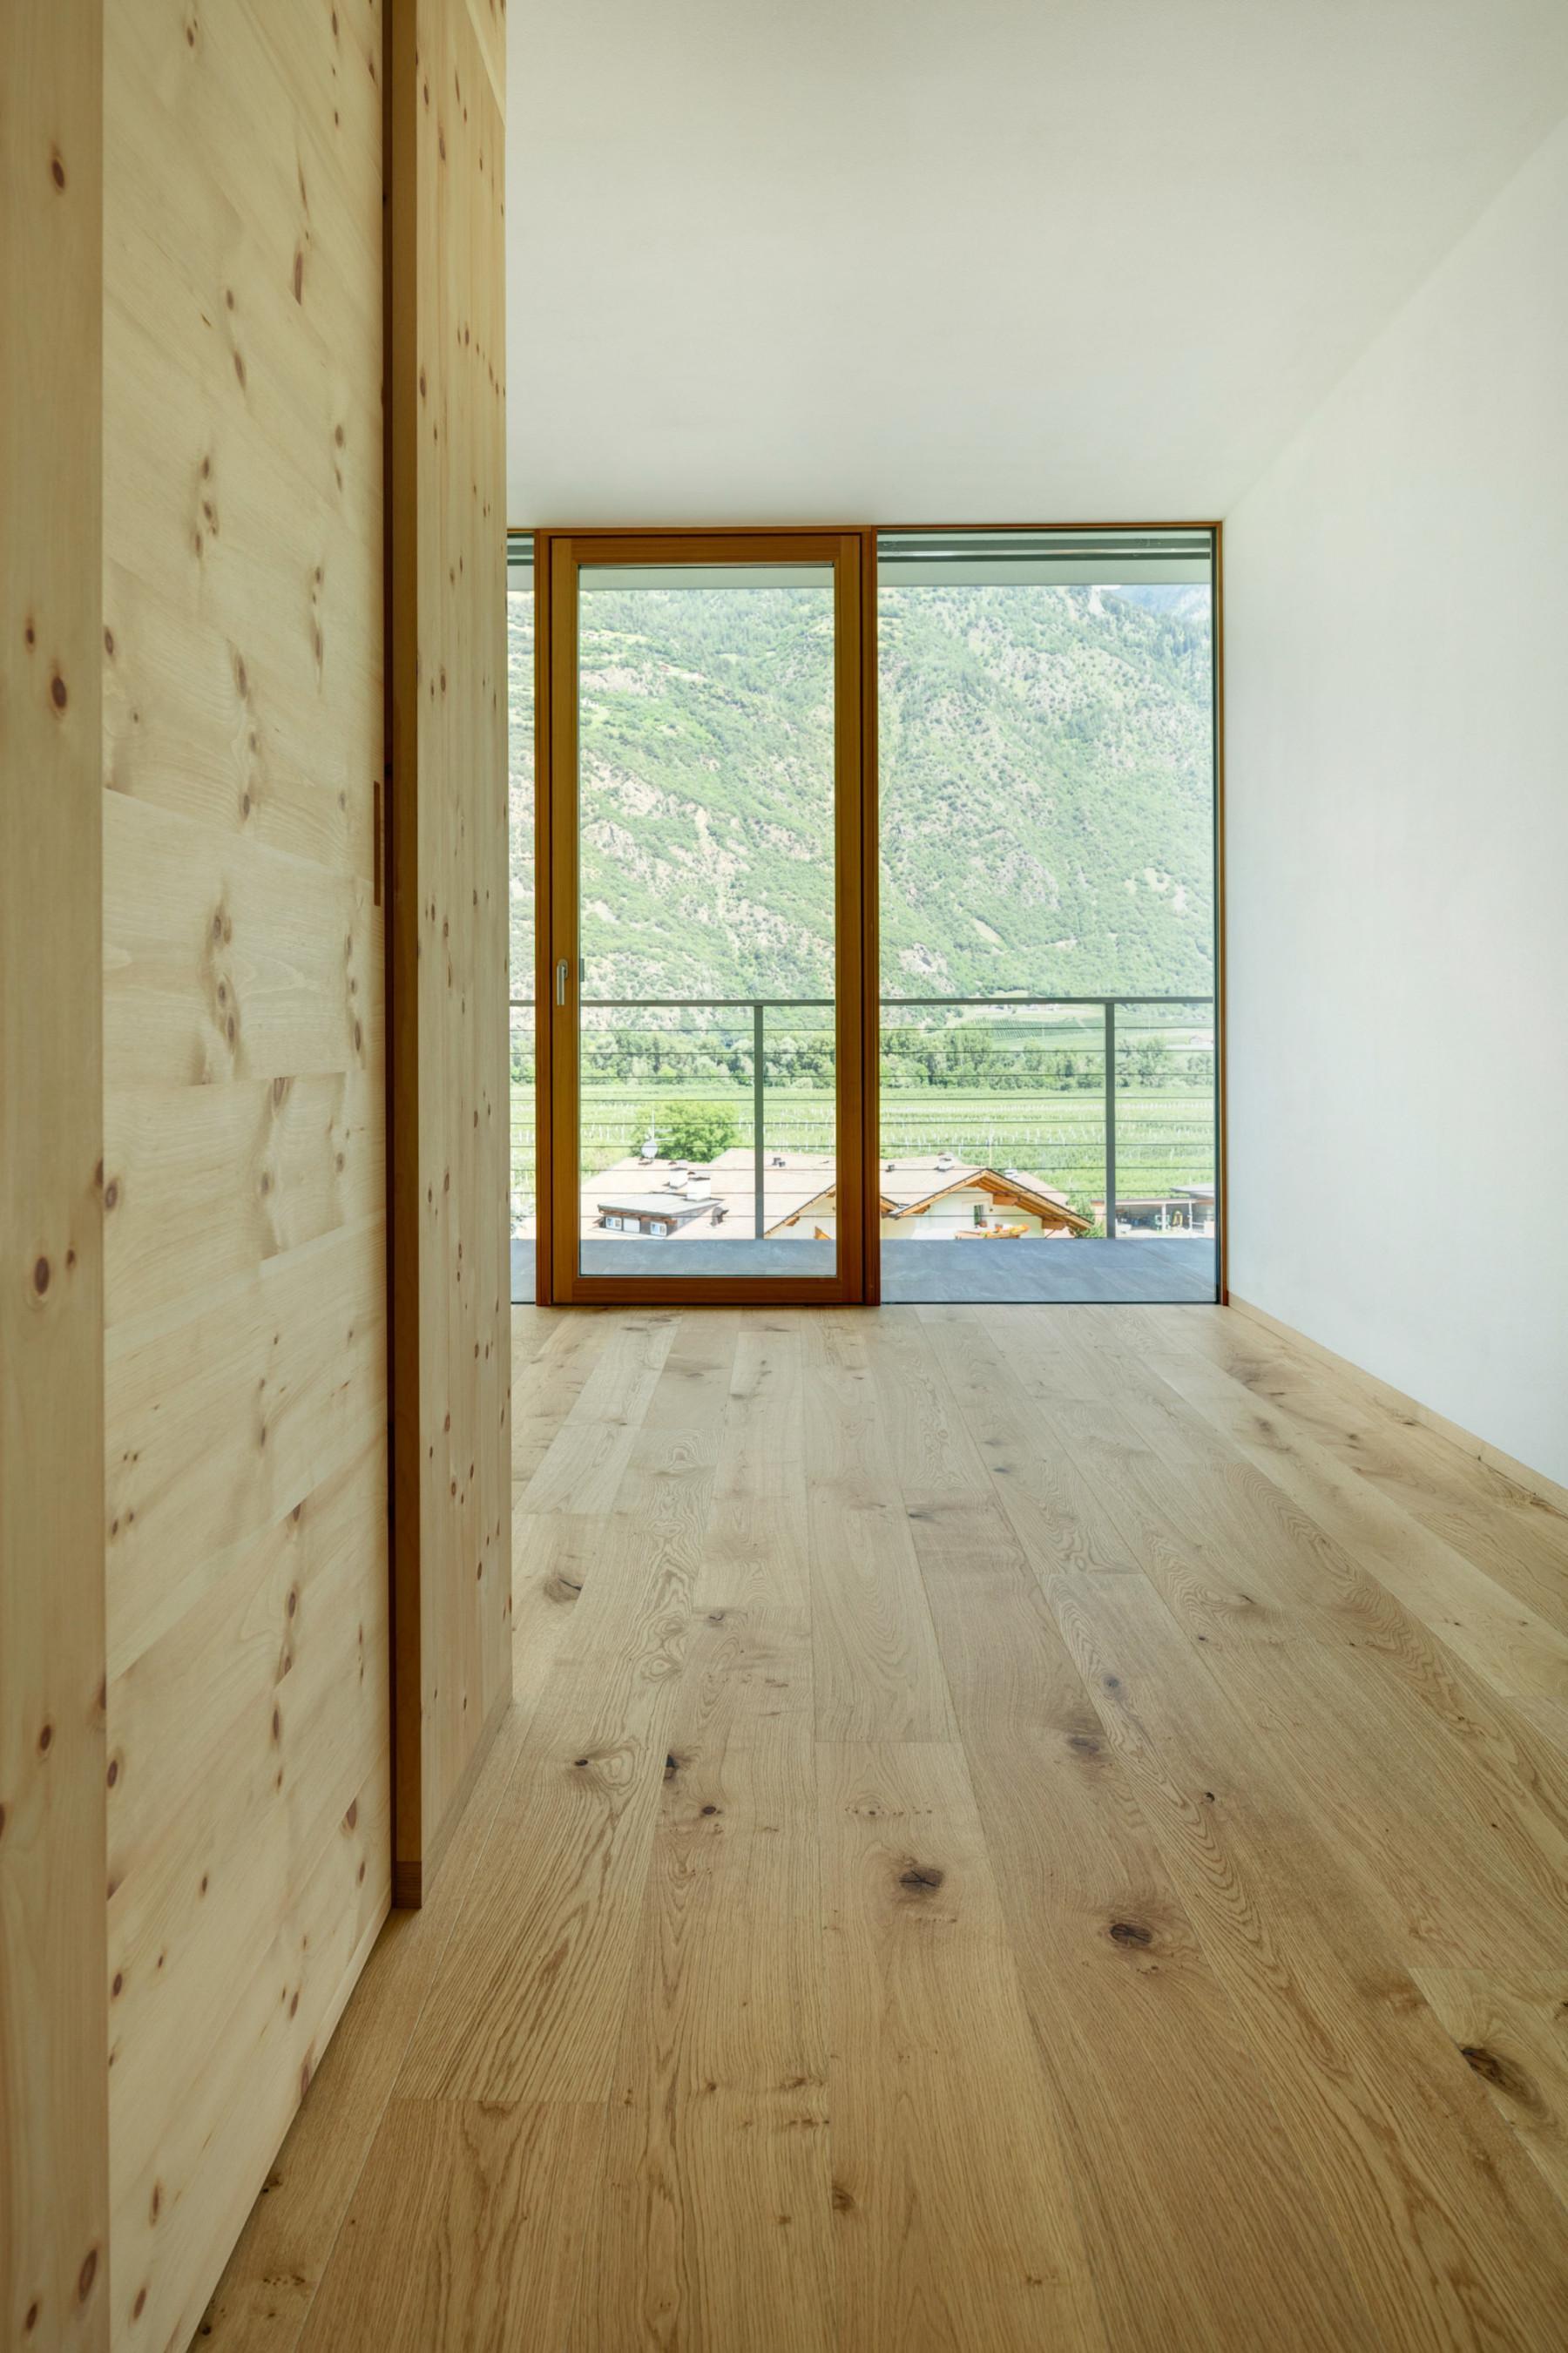 Vivere e dormire - A casa - Pietre naturali, piastrelle e ...